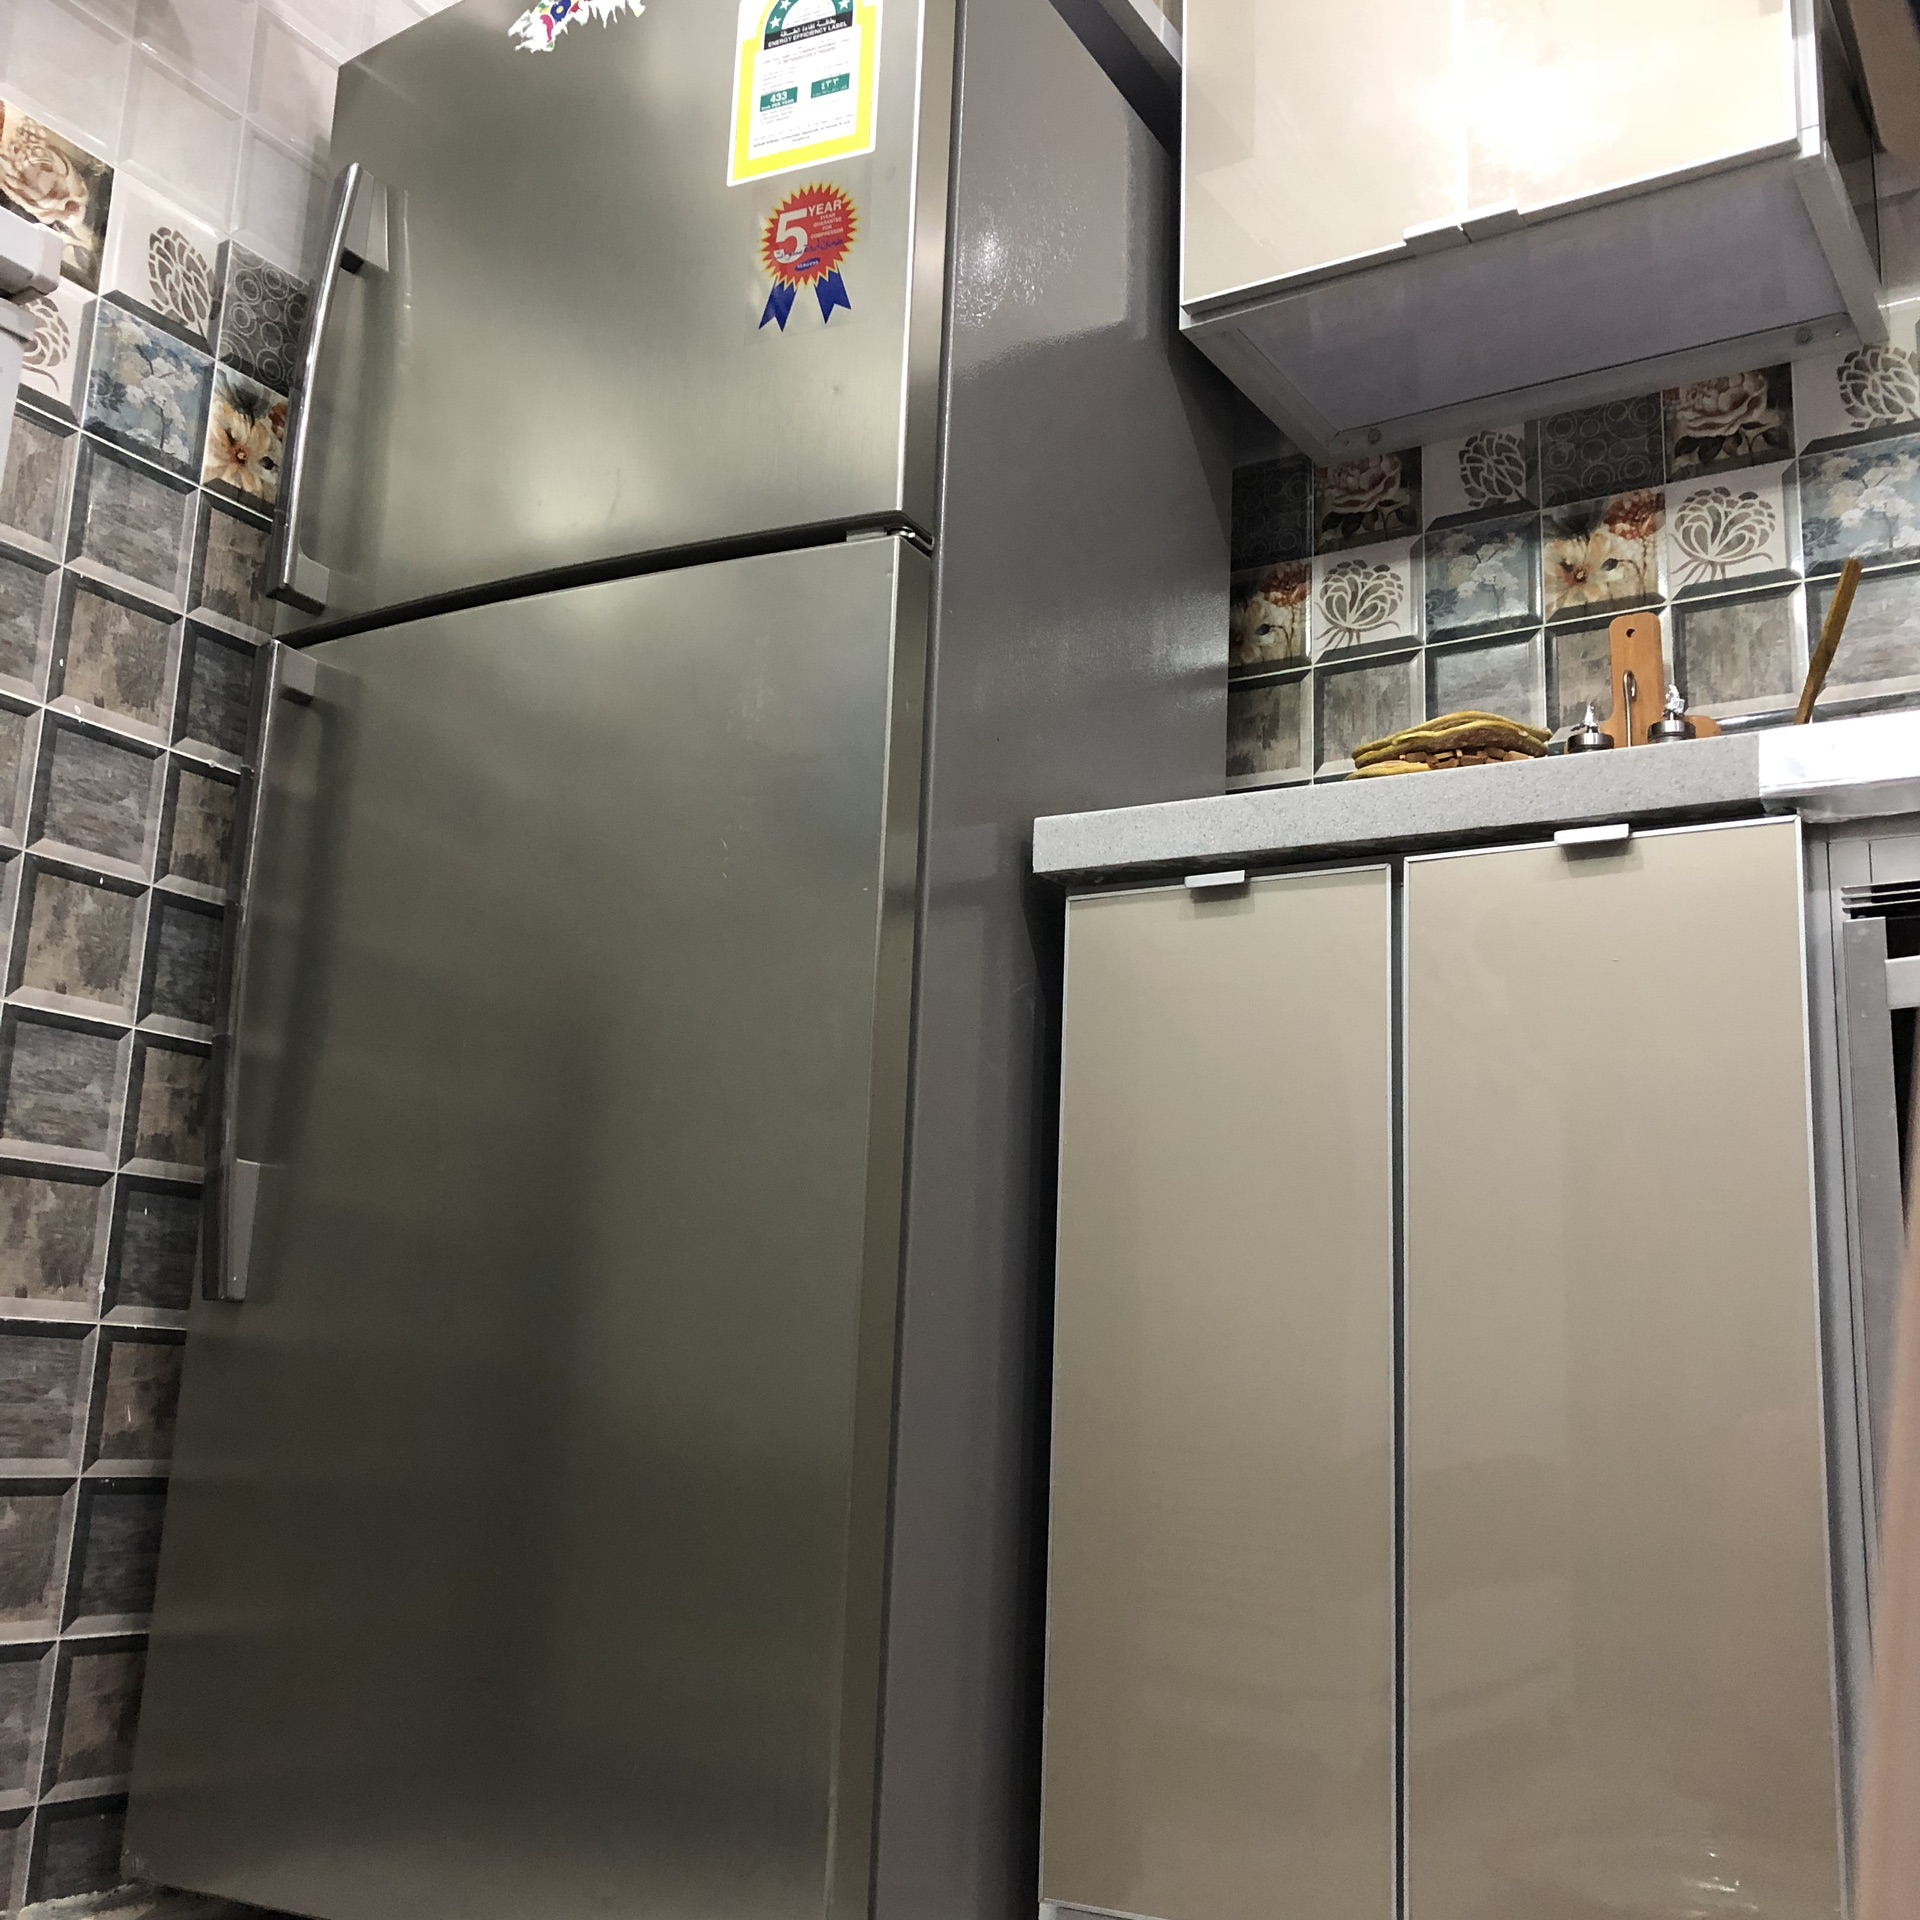 LG latest model fridge with 2doors up and down-  للبيع ثلاجه سامسونج الحجم...